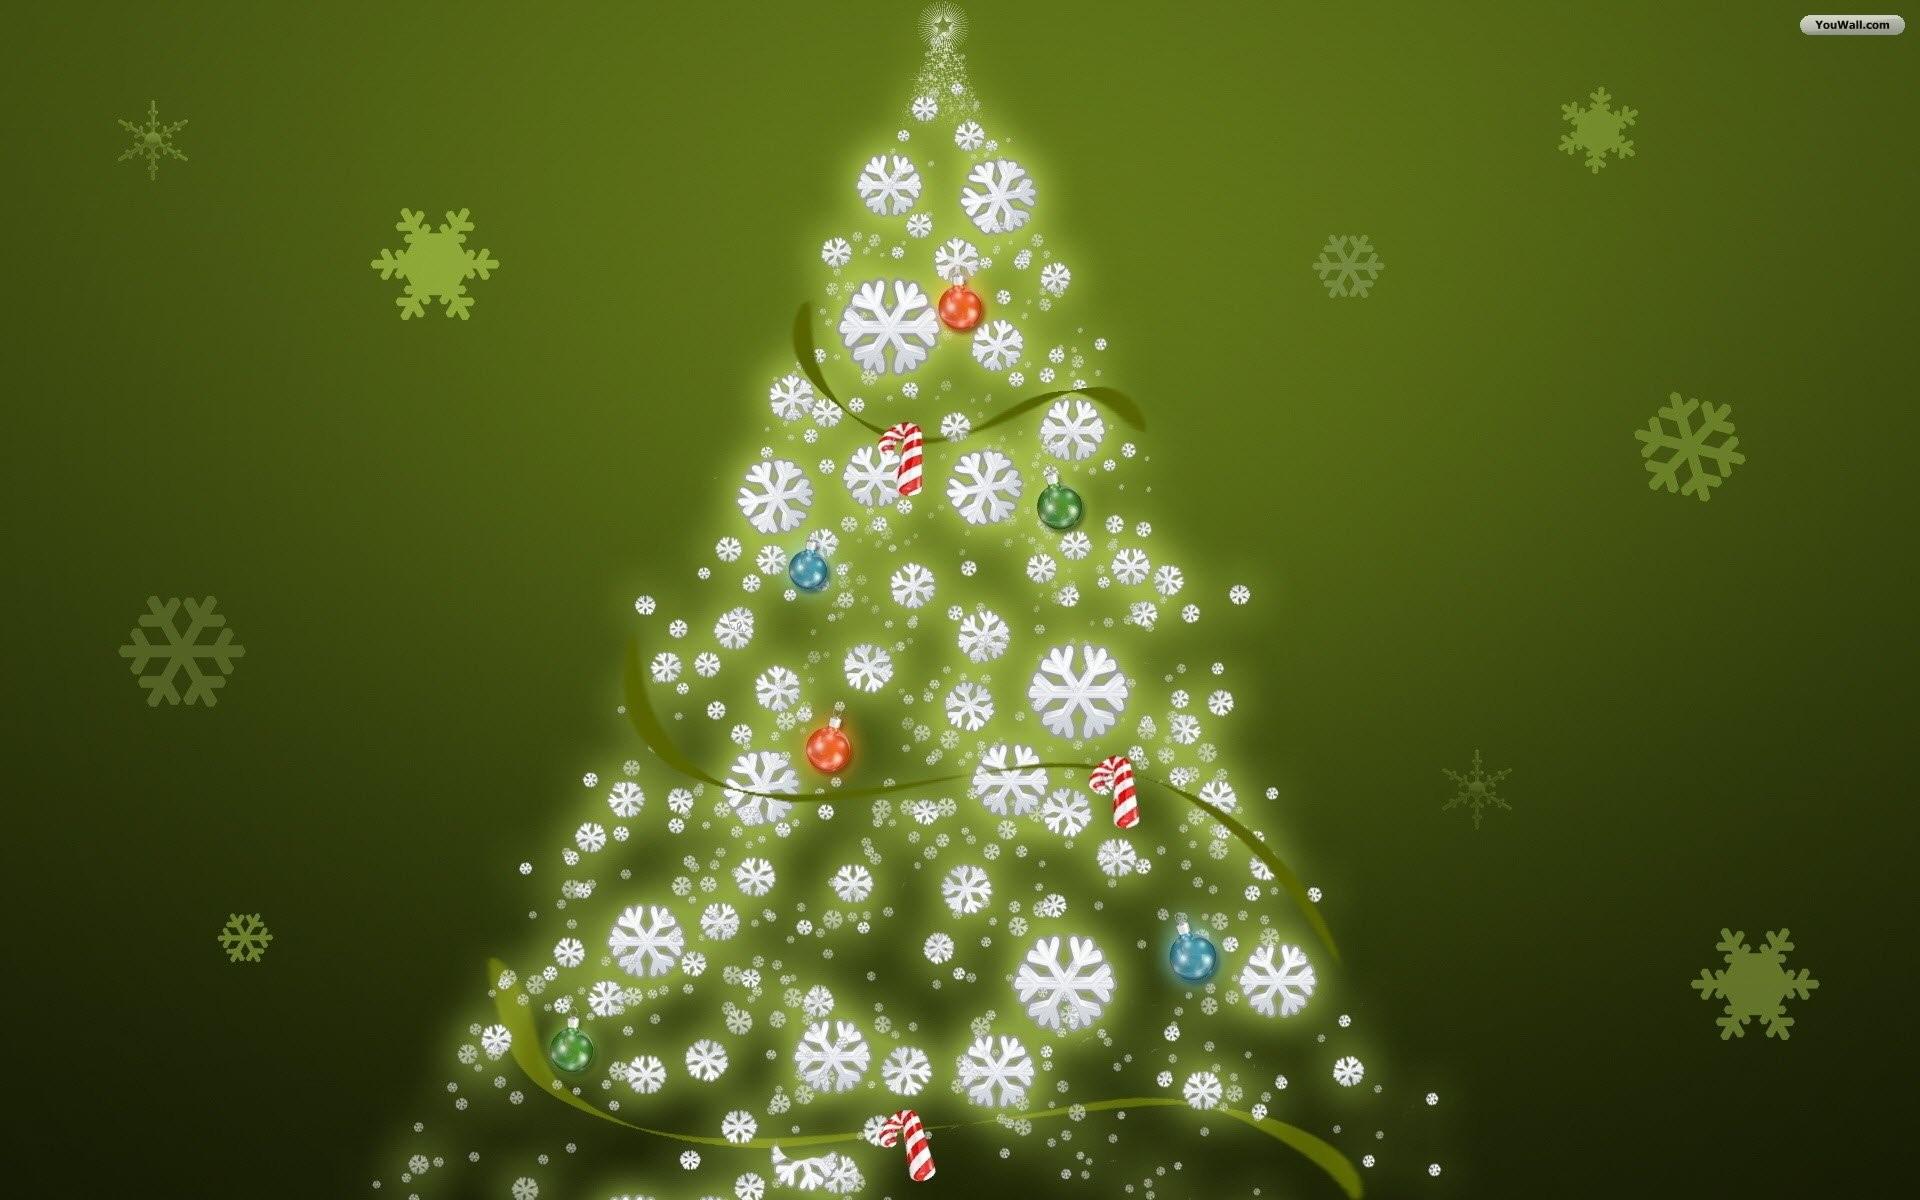 christmas trees wallpaper ·①